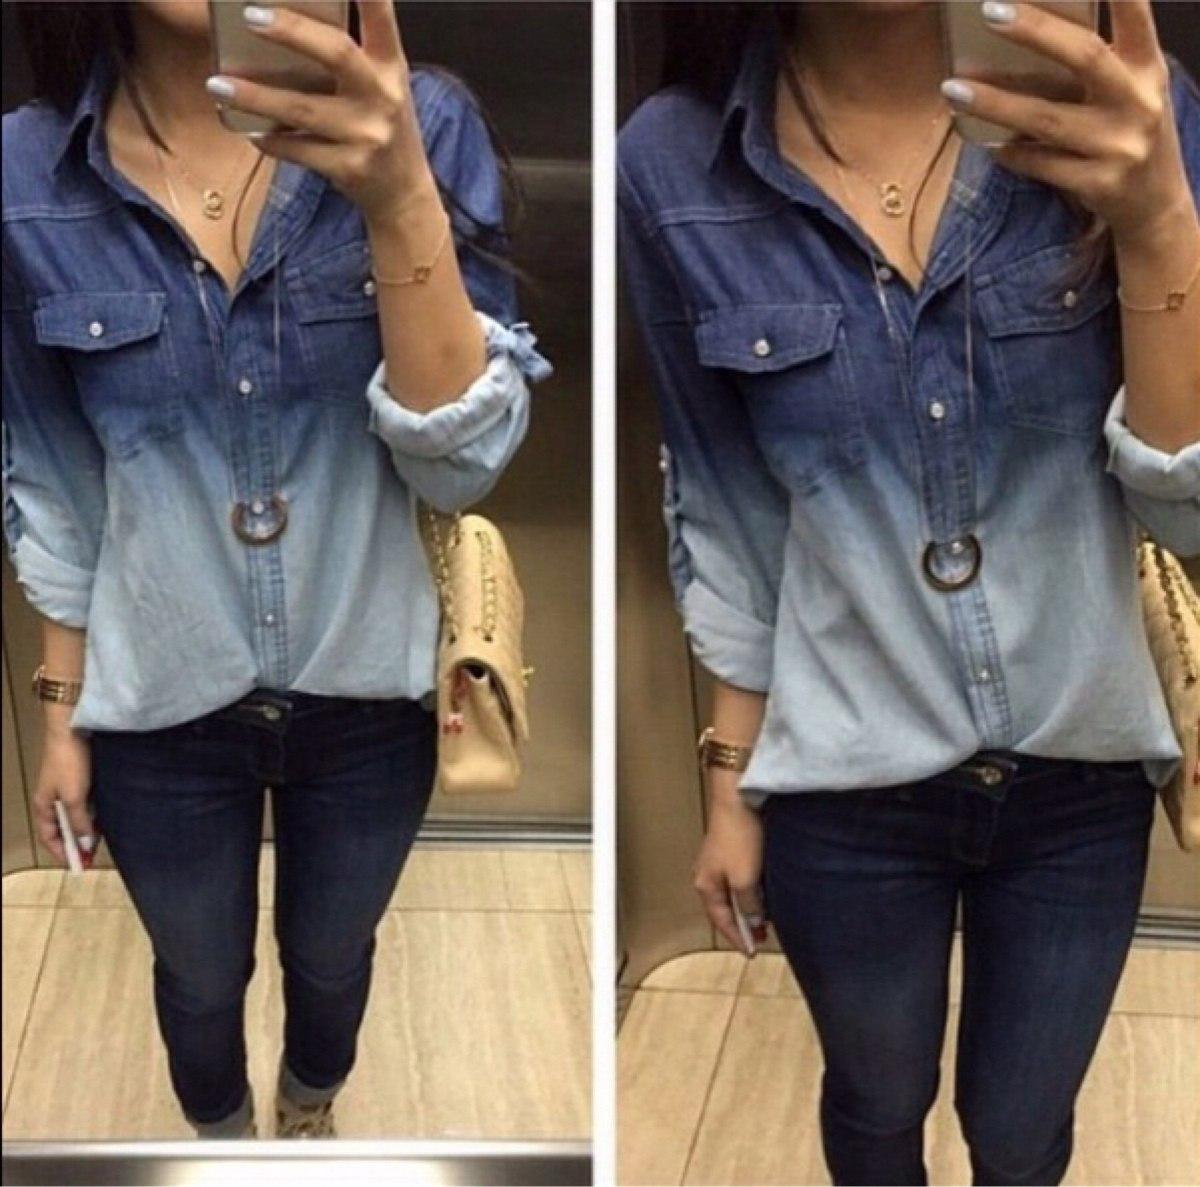 29e7881958 camisa jeans estampada feminina tie dye manchada. Carregando zoom.